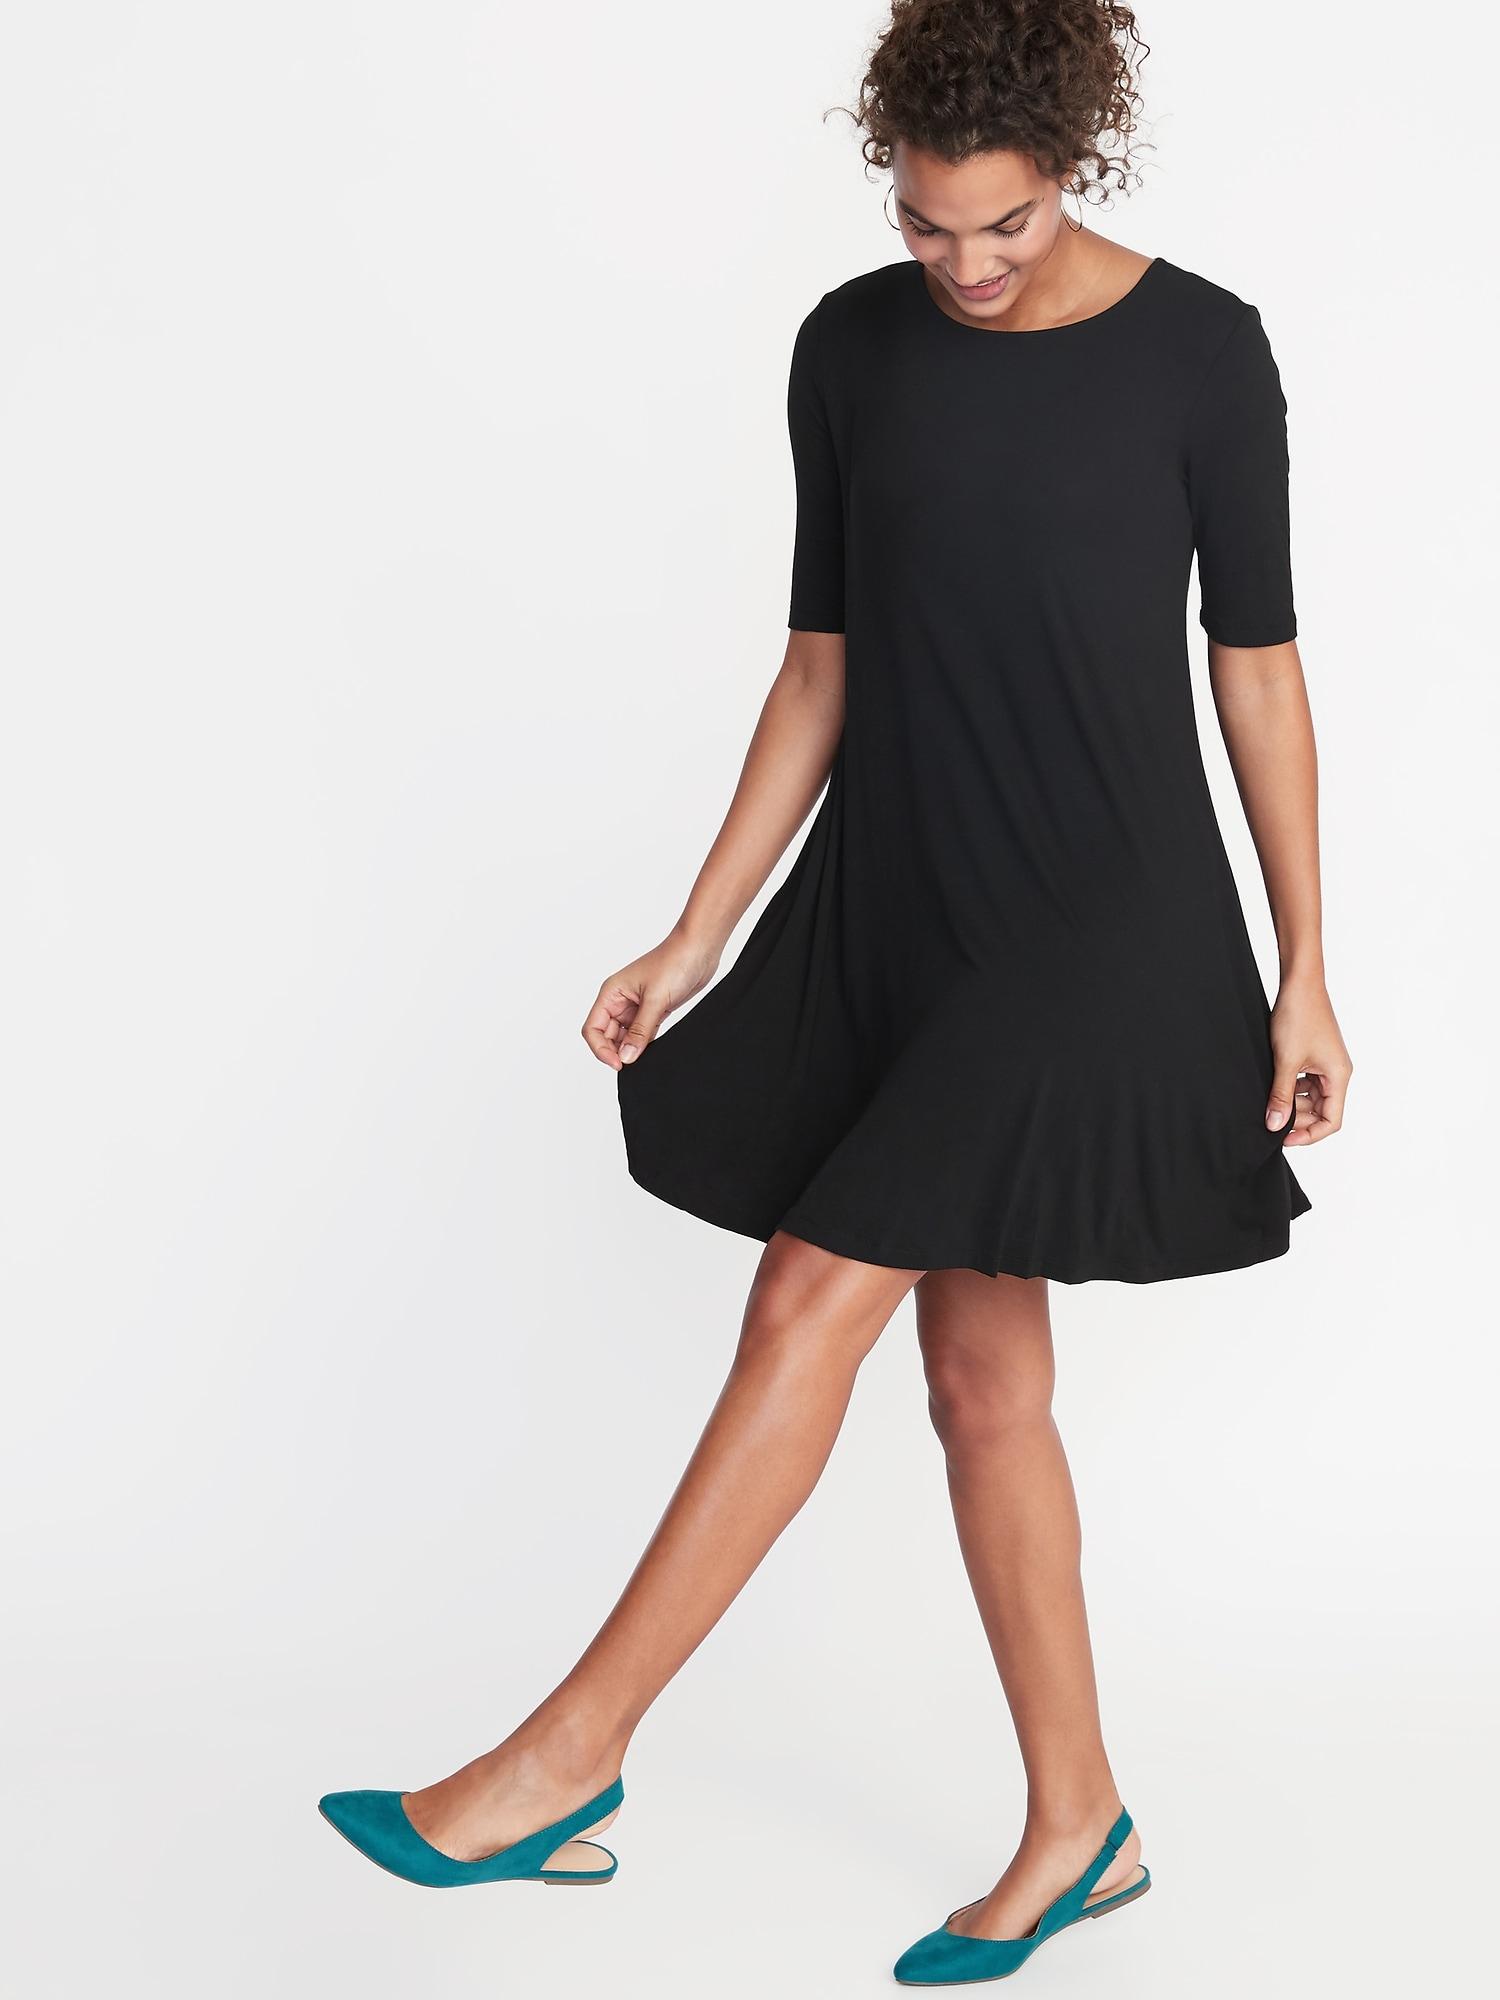 00988a372eaa2 Jersey Swing Dress for Women | Old Navy